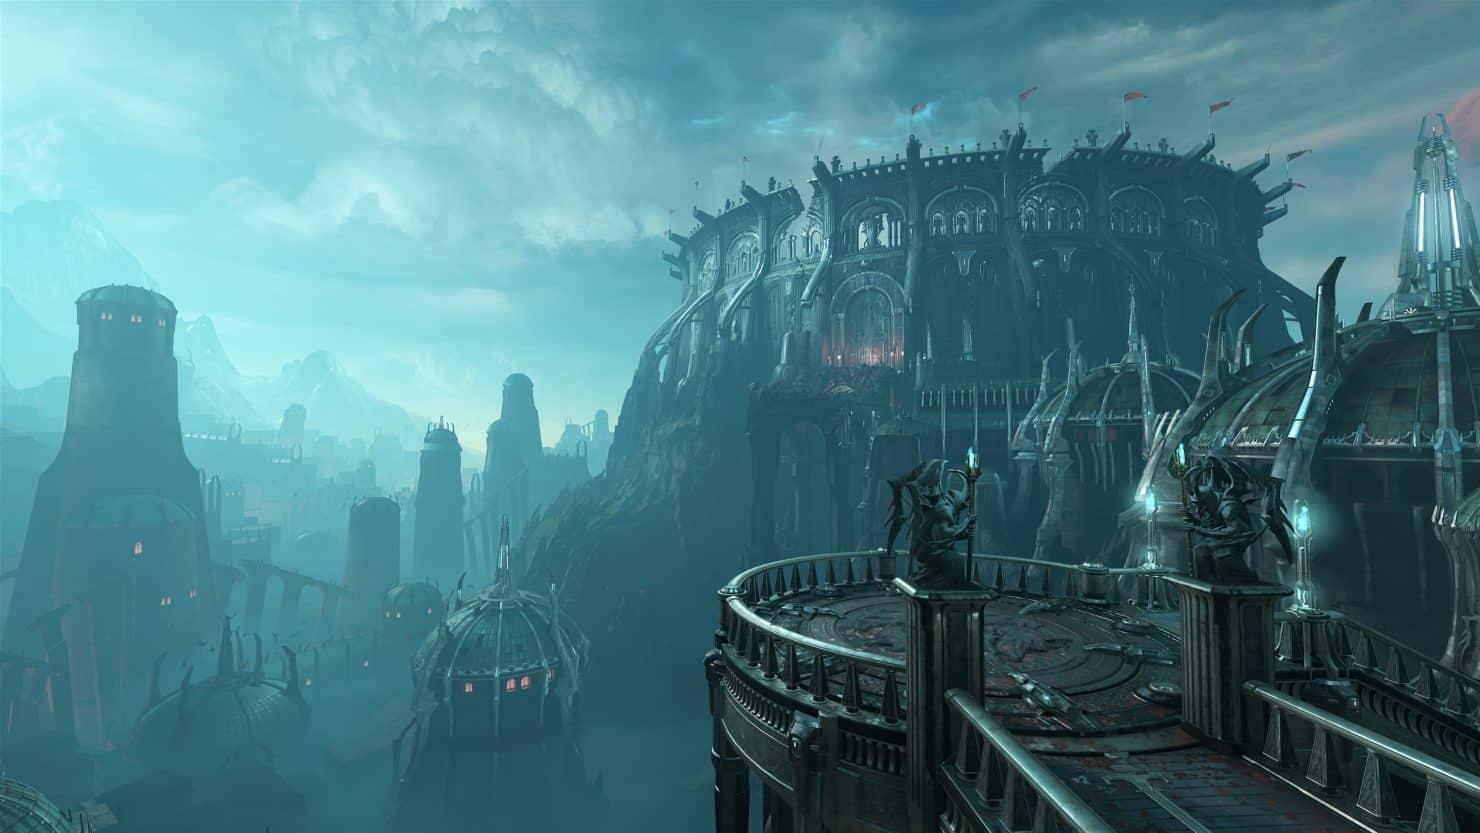 doom eternal 4 - DOOM Eternal - Primi dettagli, Immagini e gameplay